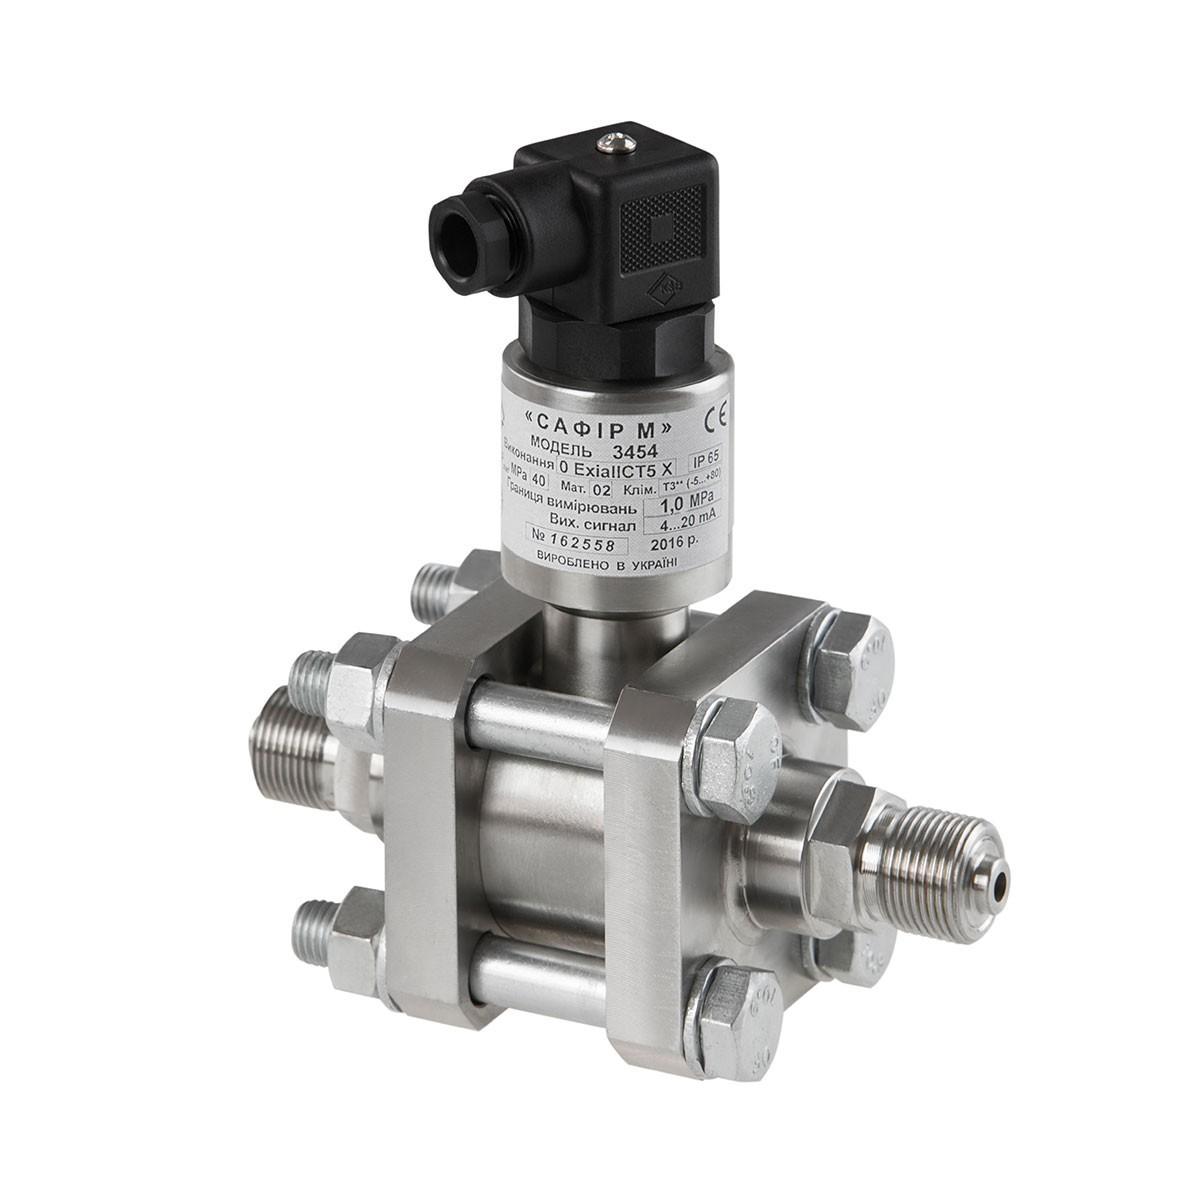 Differential pressure transducers Safir-M 3454